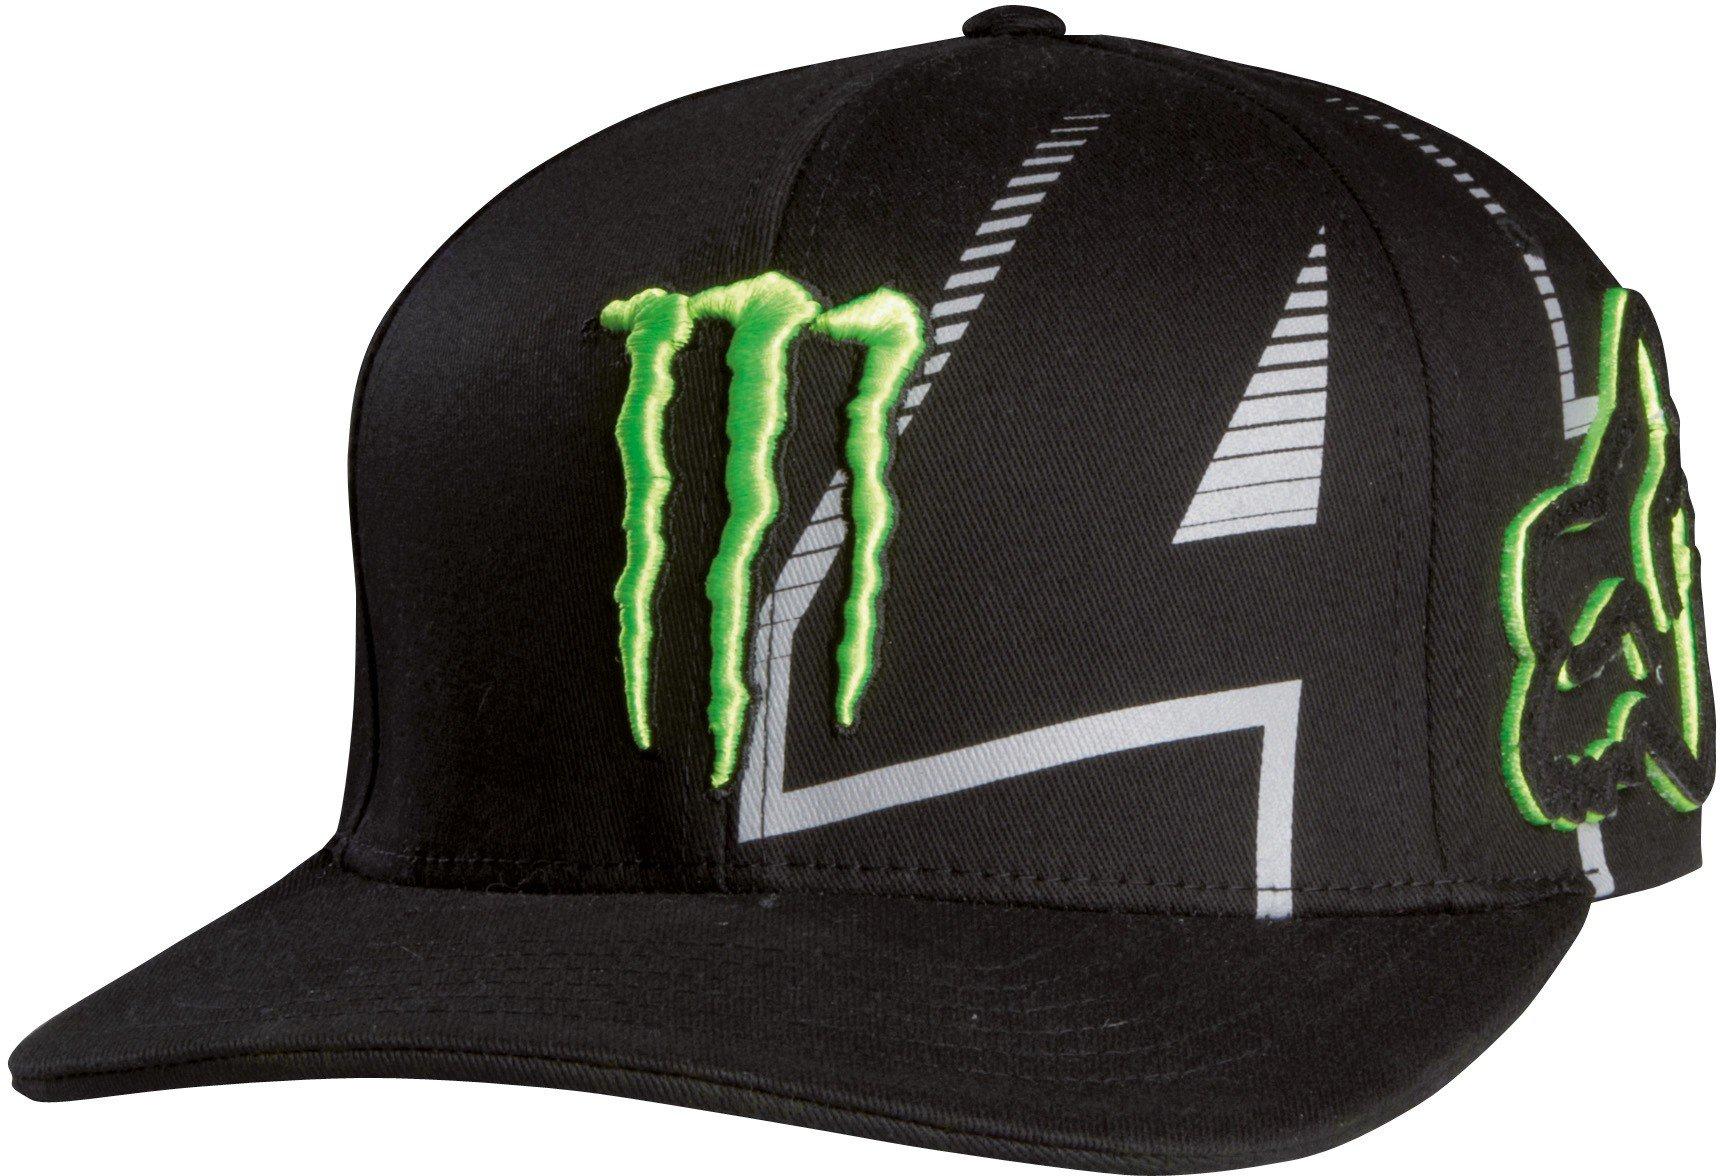 Čepice/Kšiltovka FOX Flexfit Monster černá